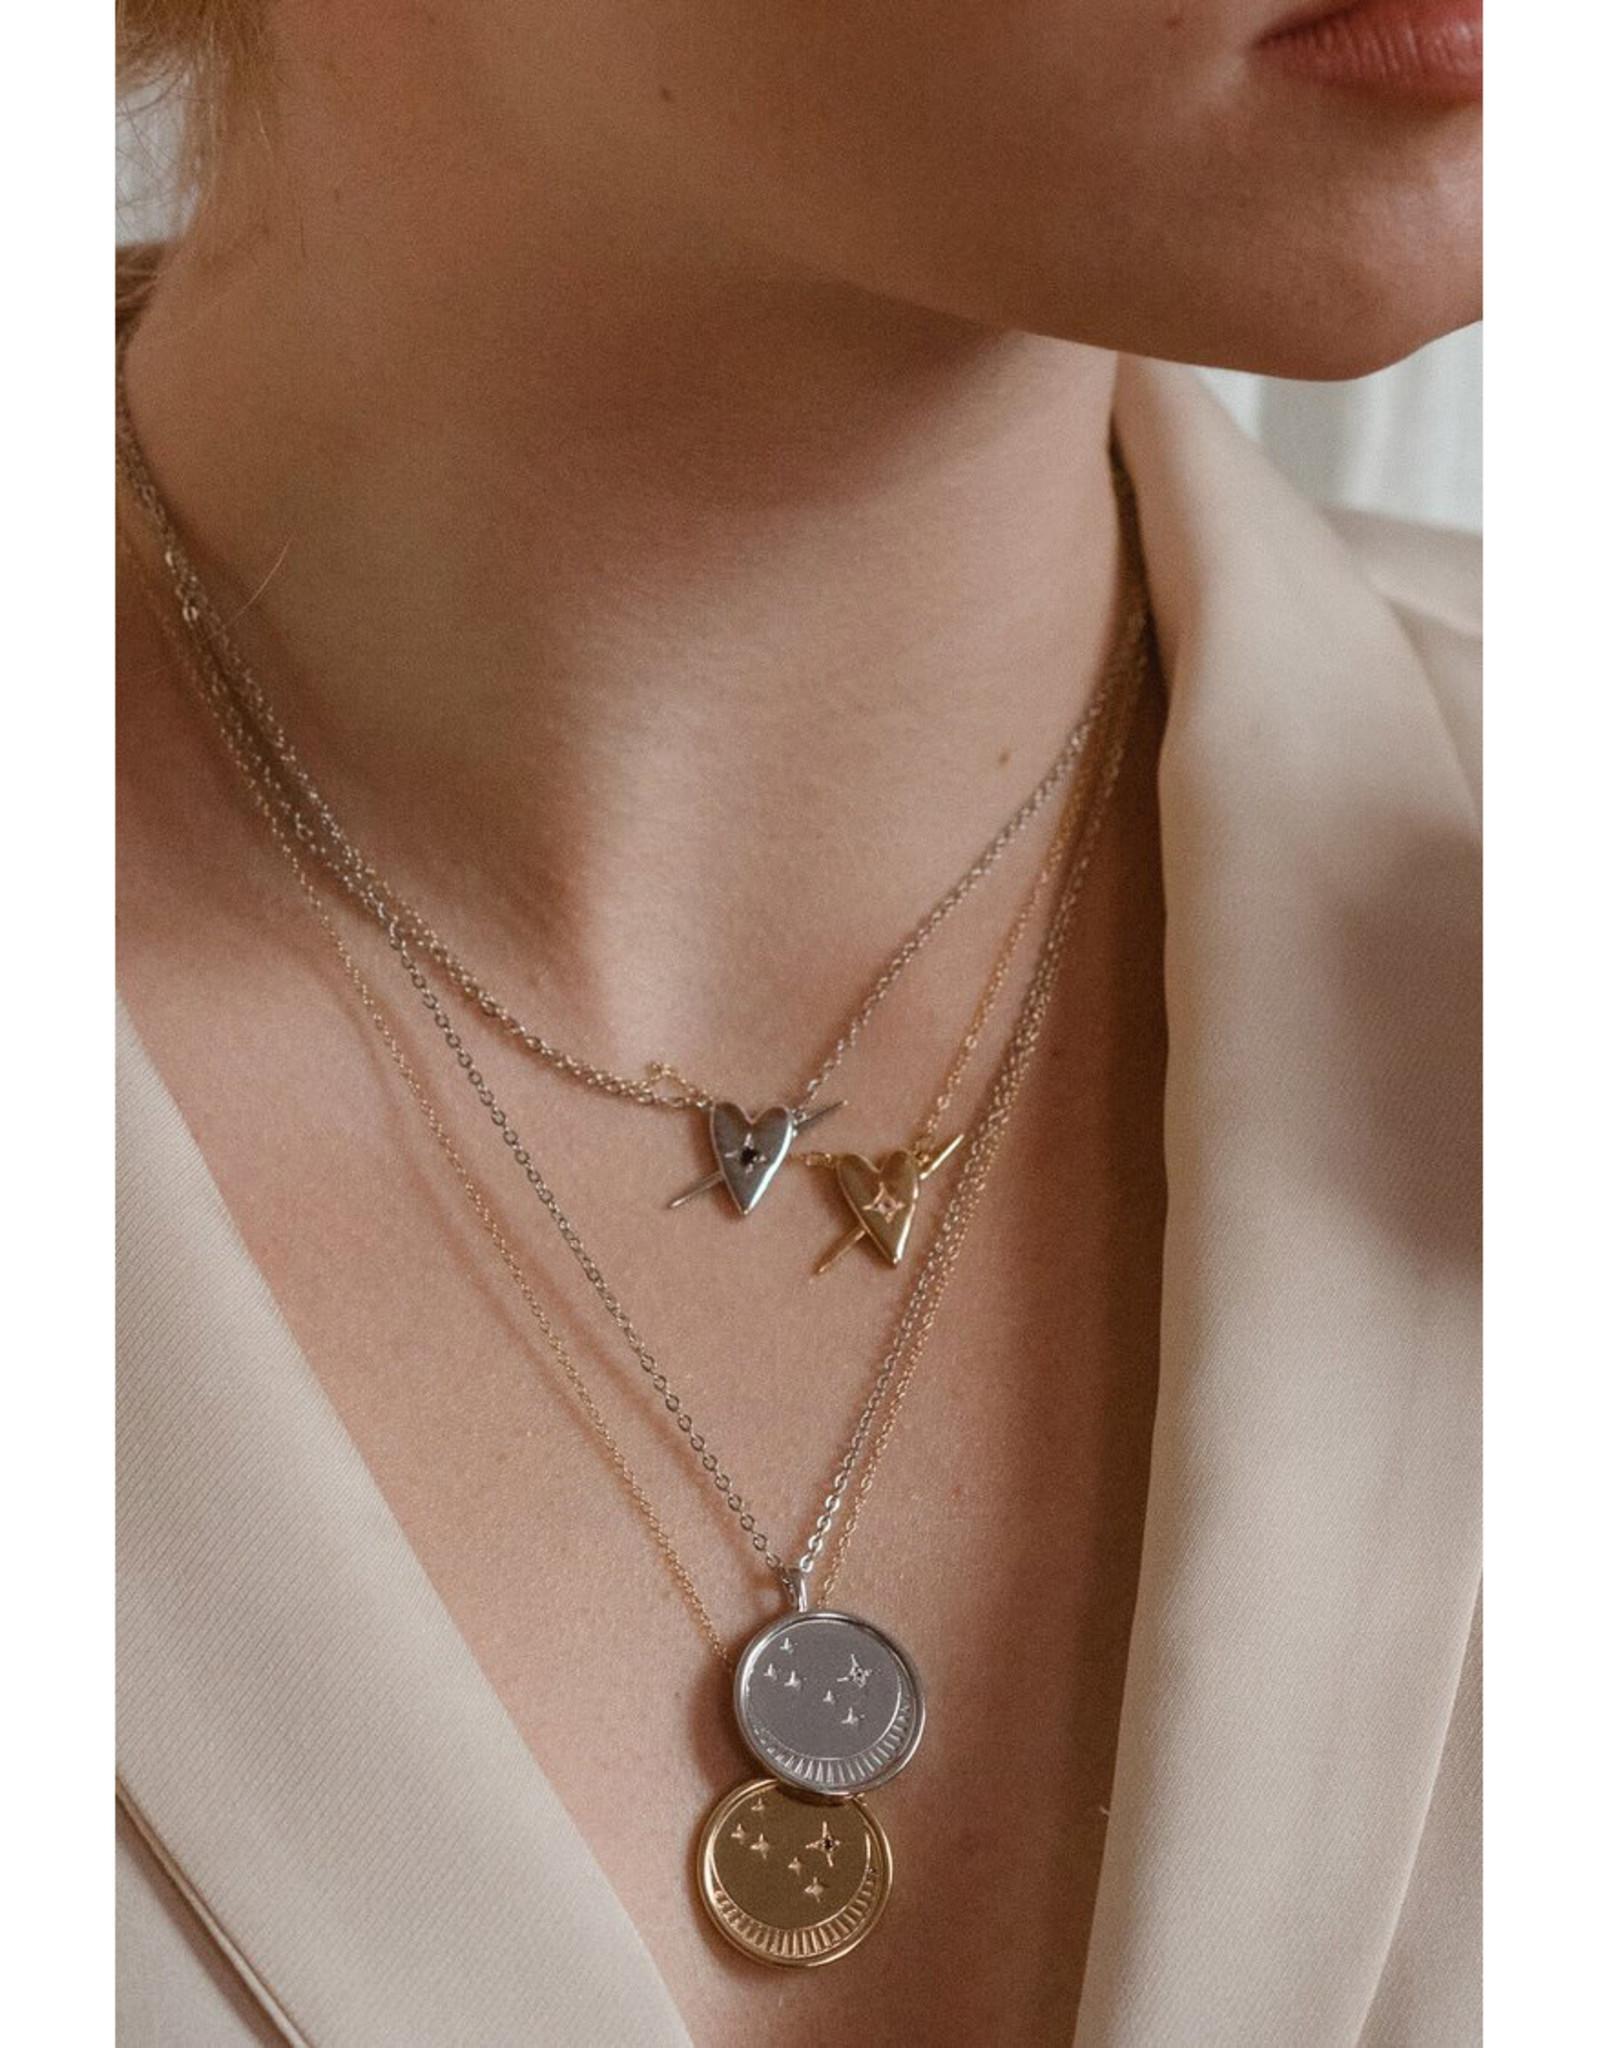 Sarah Mulder Jewelry Gold Franz Necklace - Rose Quartz